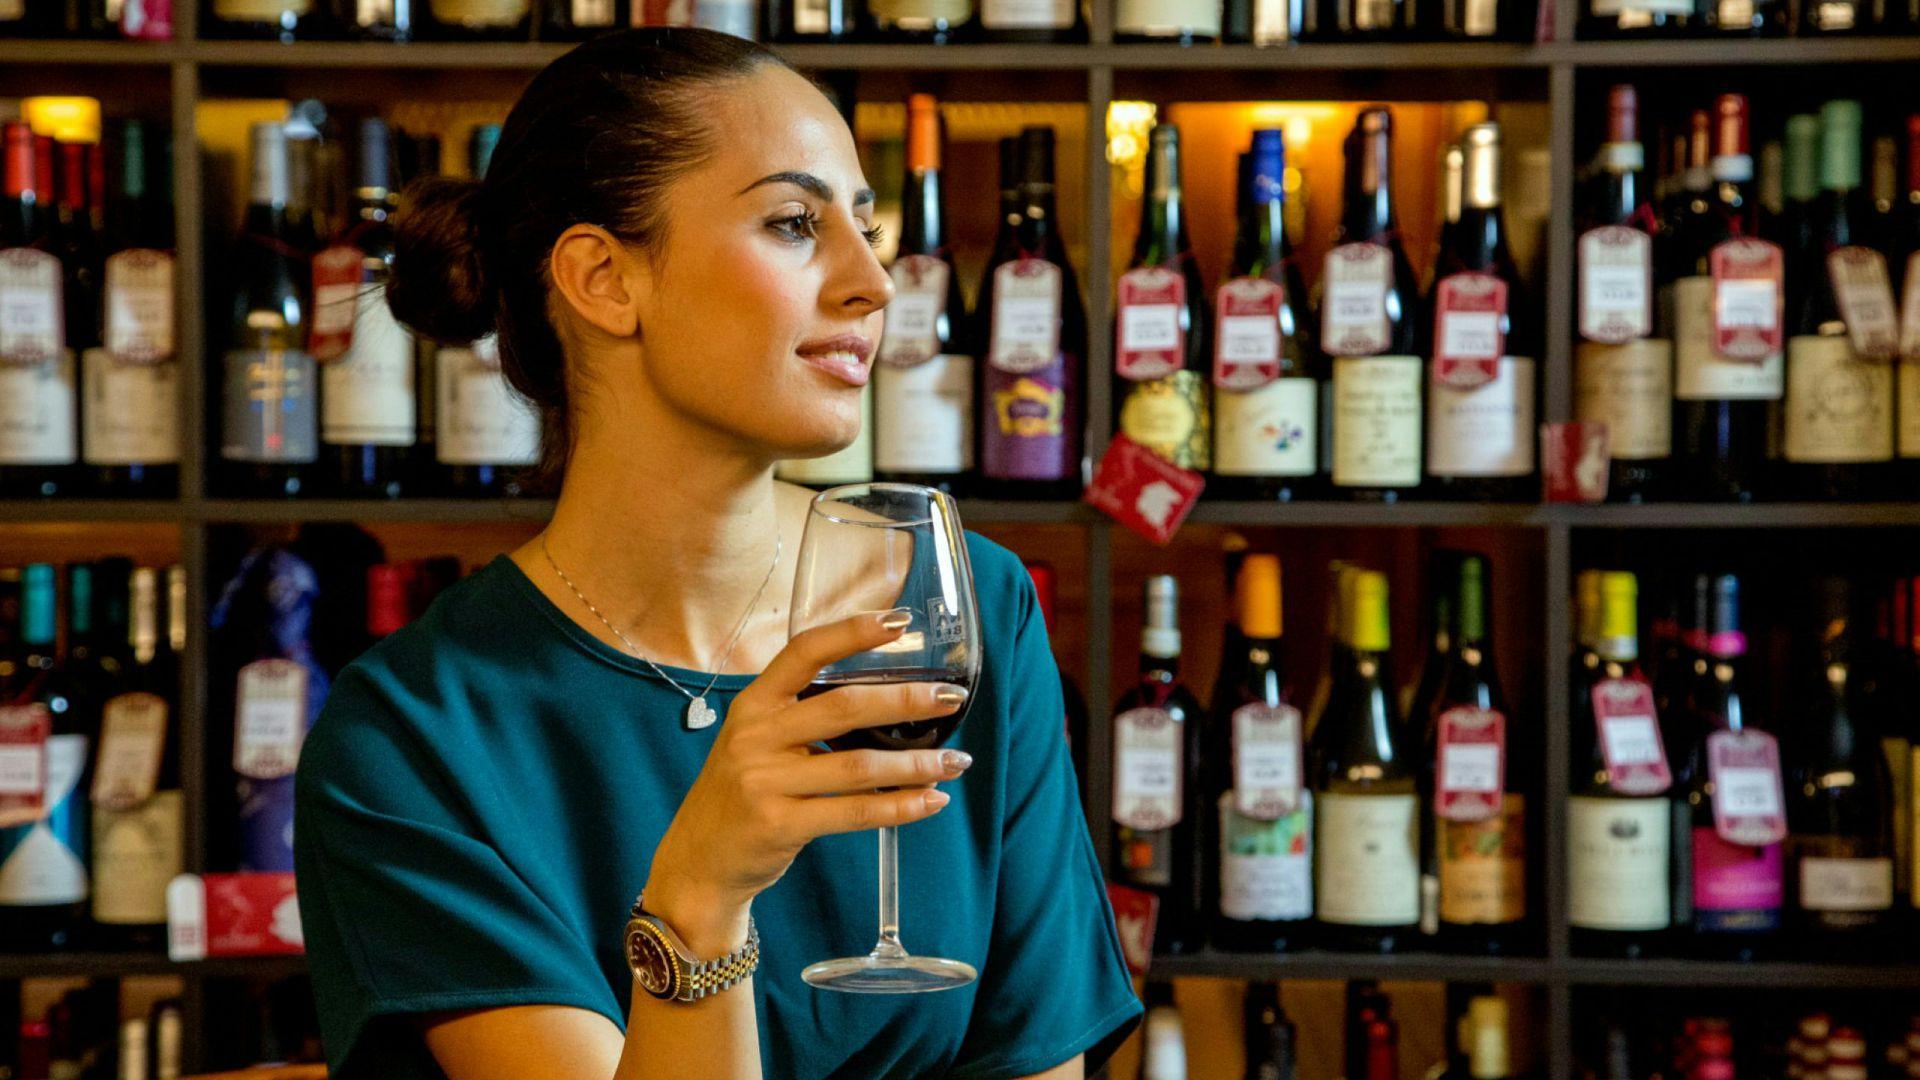 Foto-Hotel-Oxford-Roma-bar-de-vinhos-7